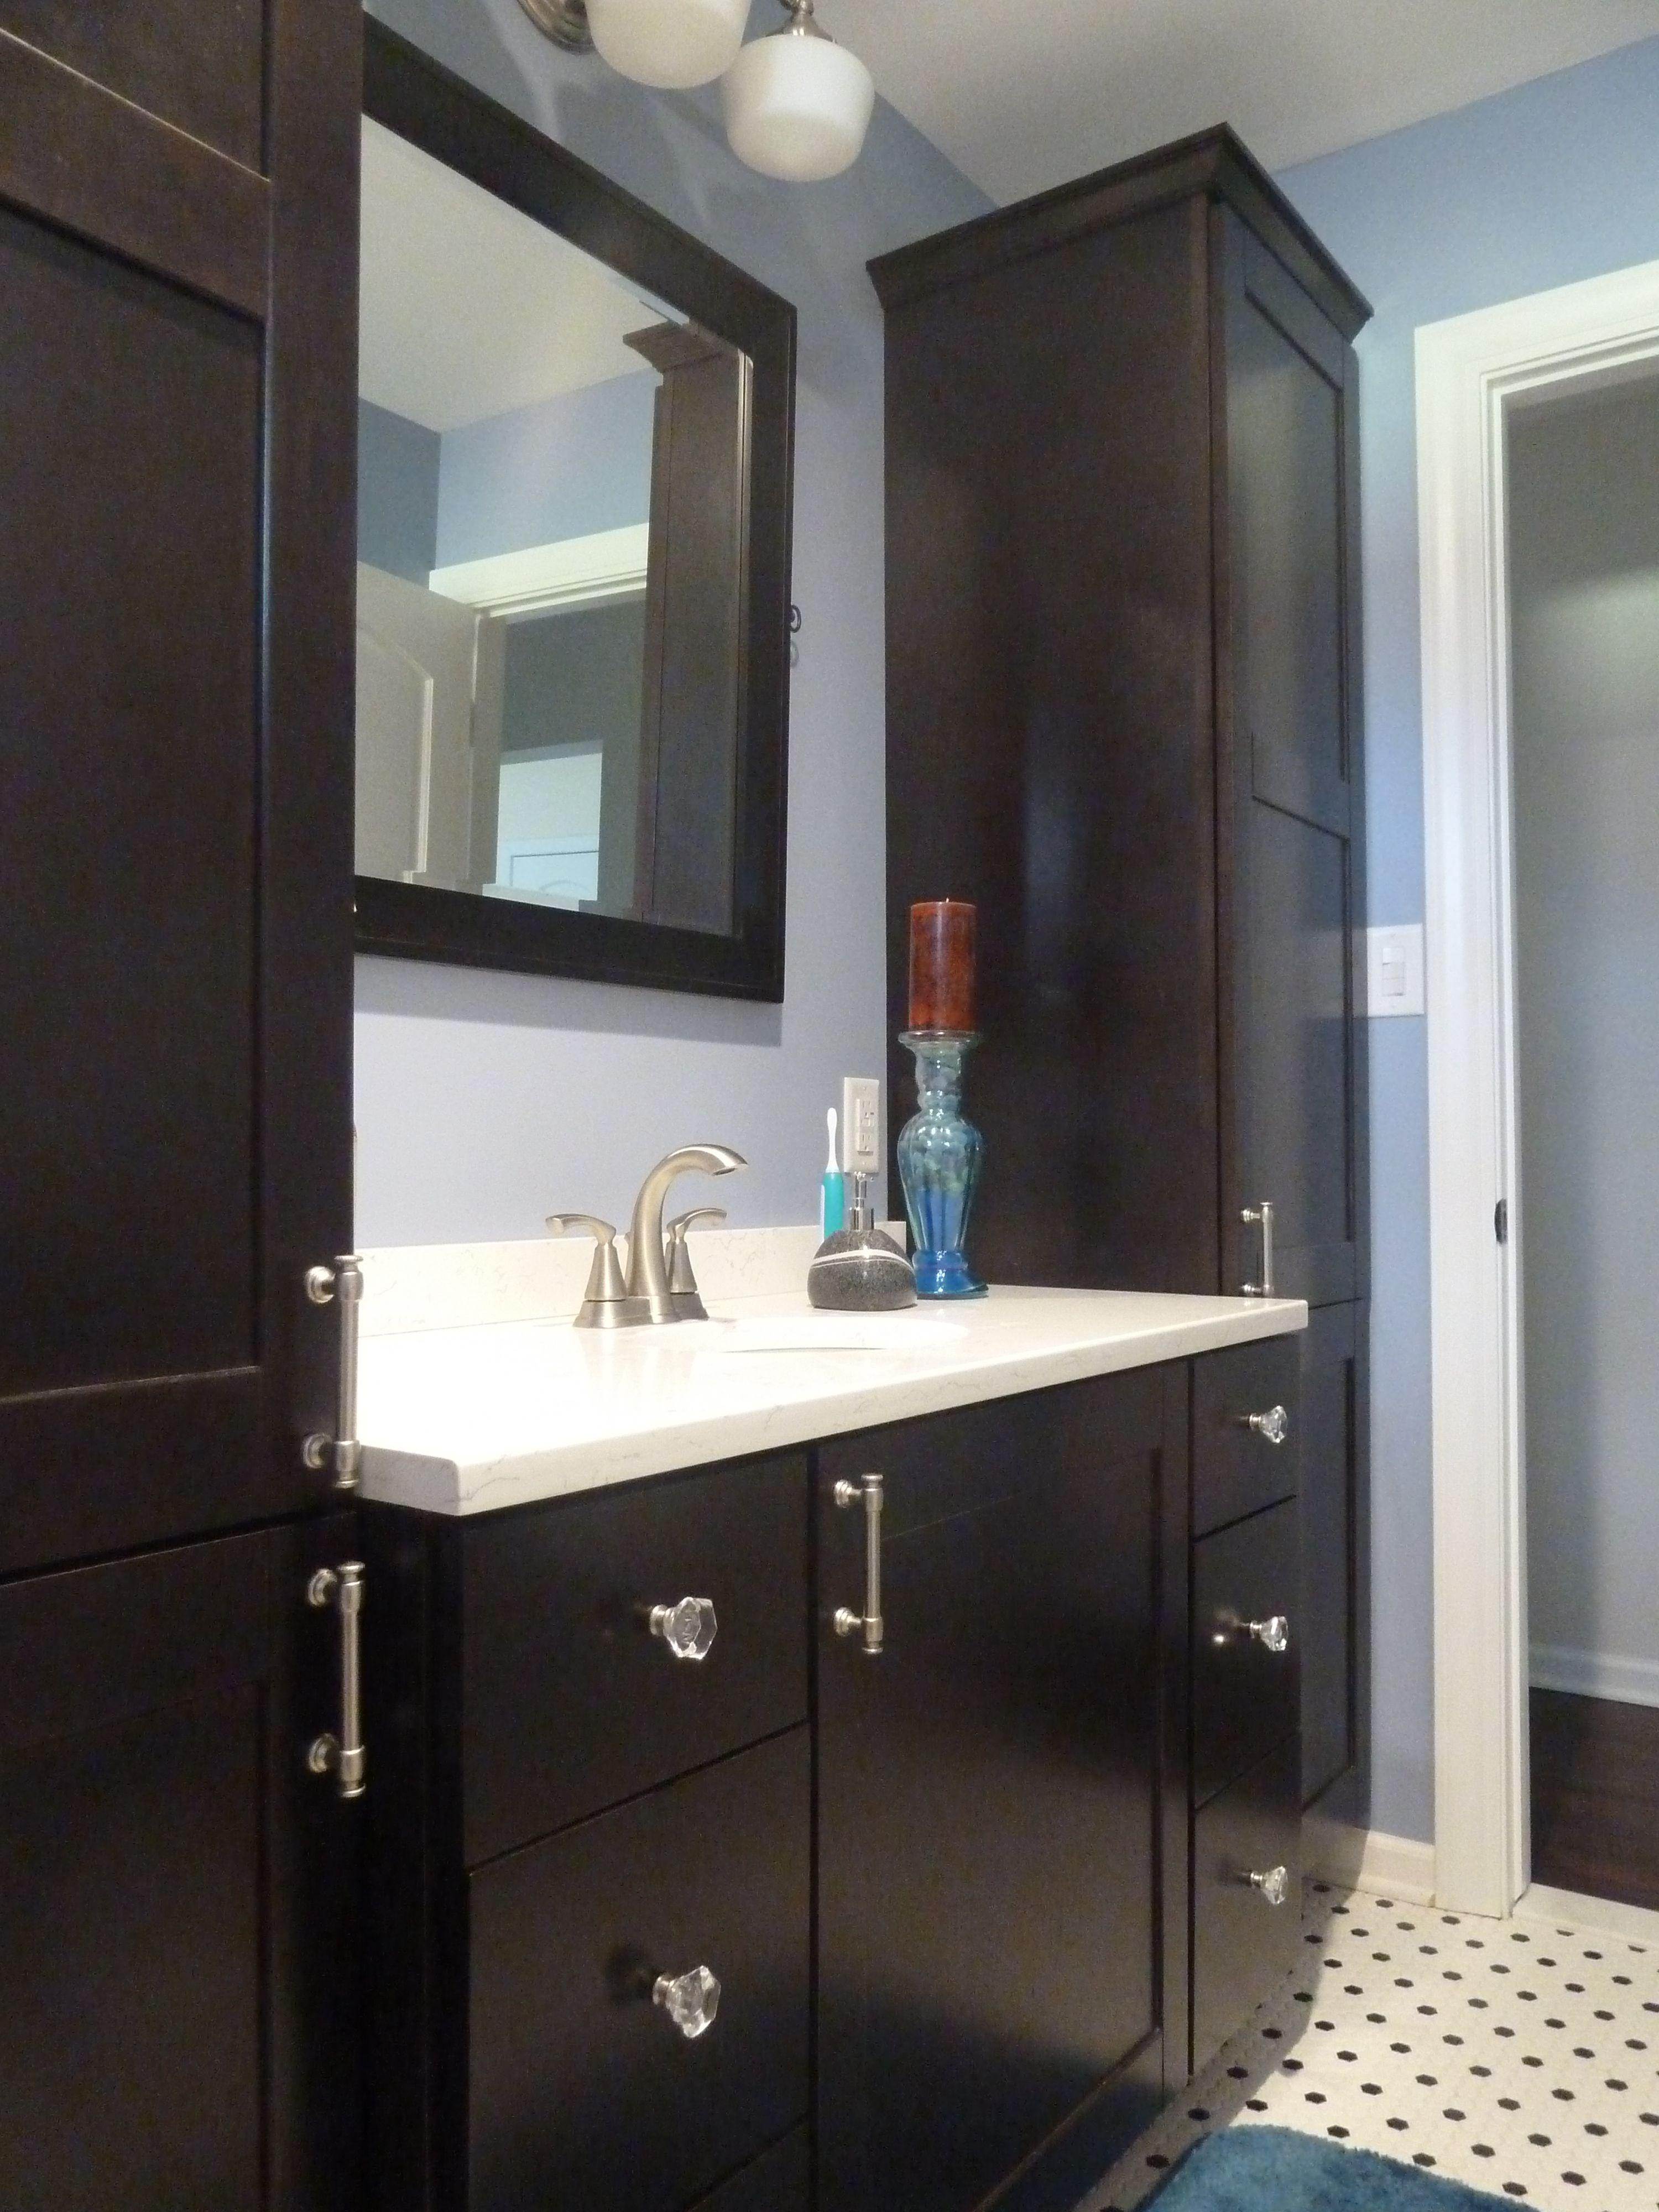 Bridgewood Custom Cabinets Tescott Door/ Full Overlay Espresso Stain  Wilsonart Haida Quartz Counter Top Shaker